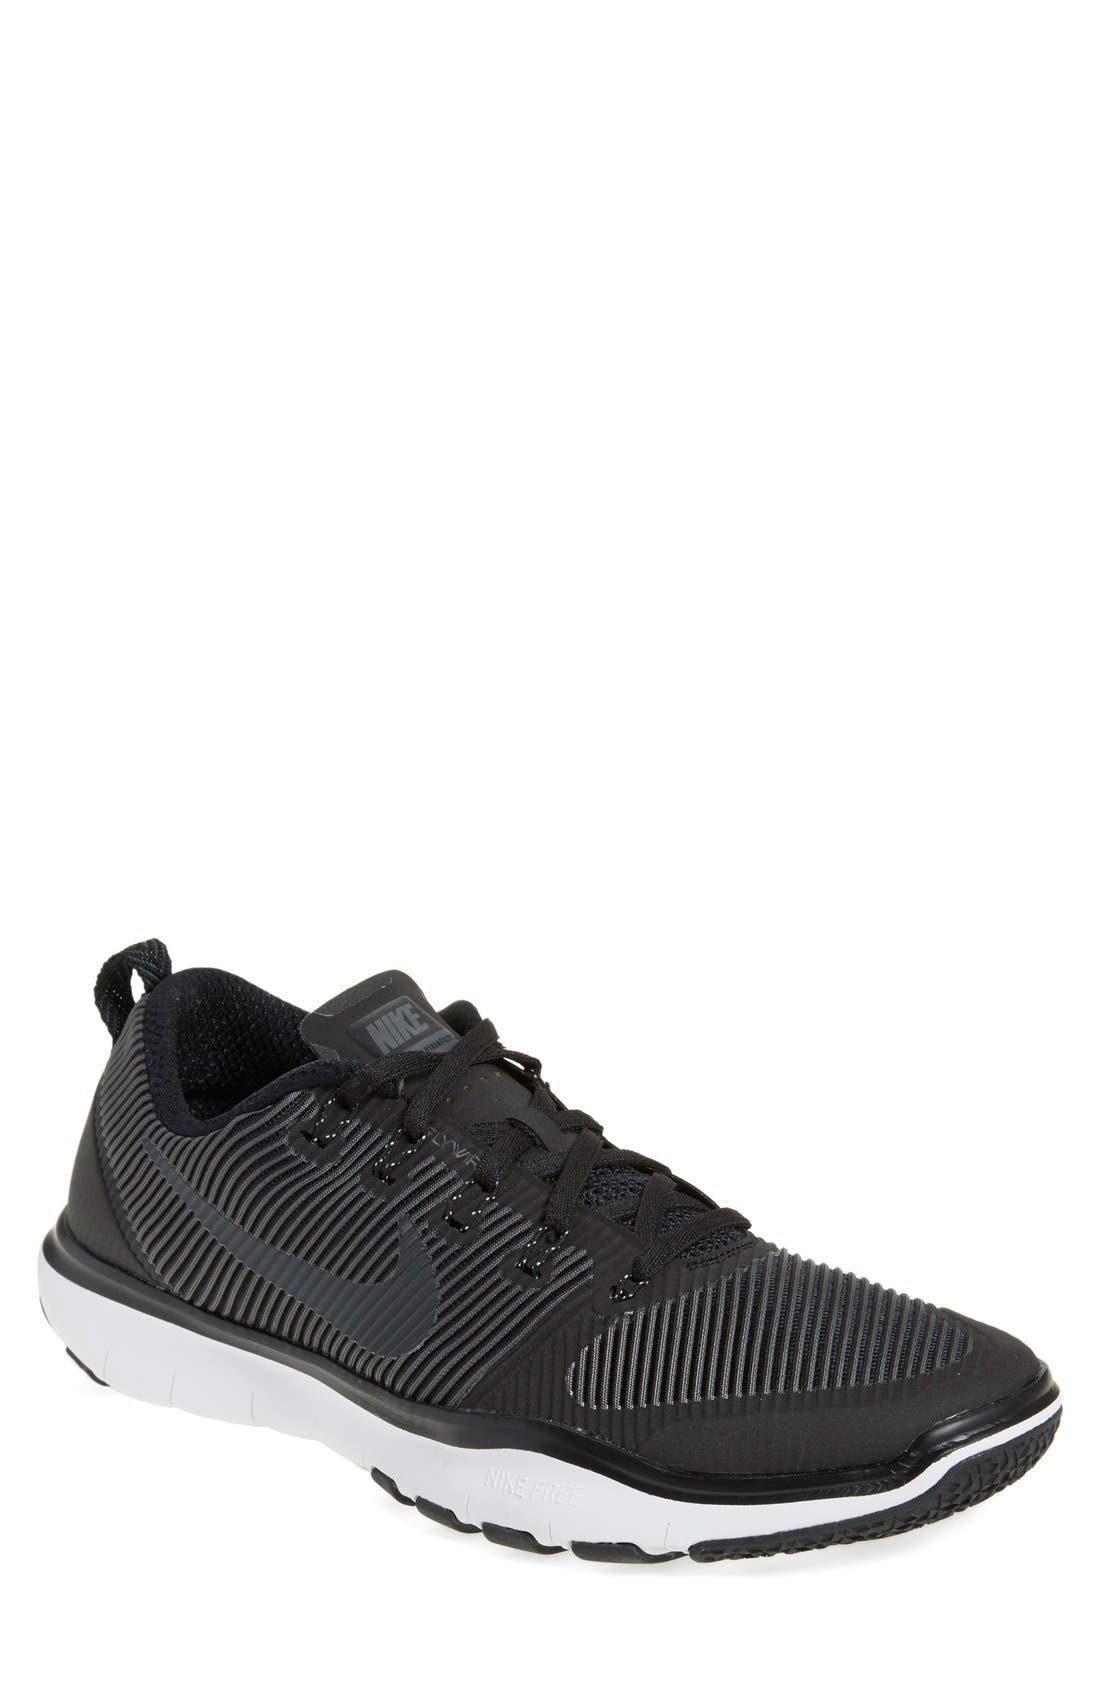 Main Image - Nike 'Free Train Versatility' Training Shoe (Men)